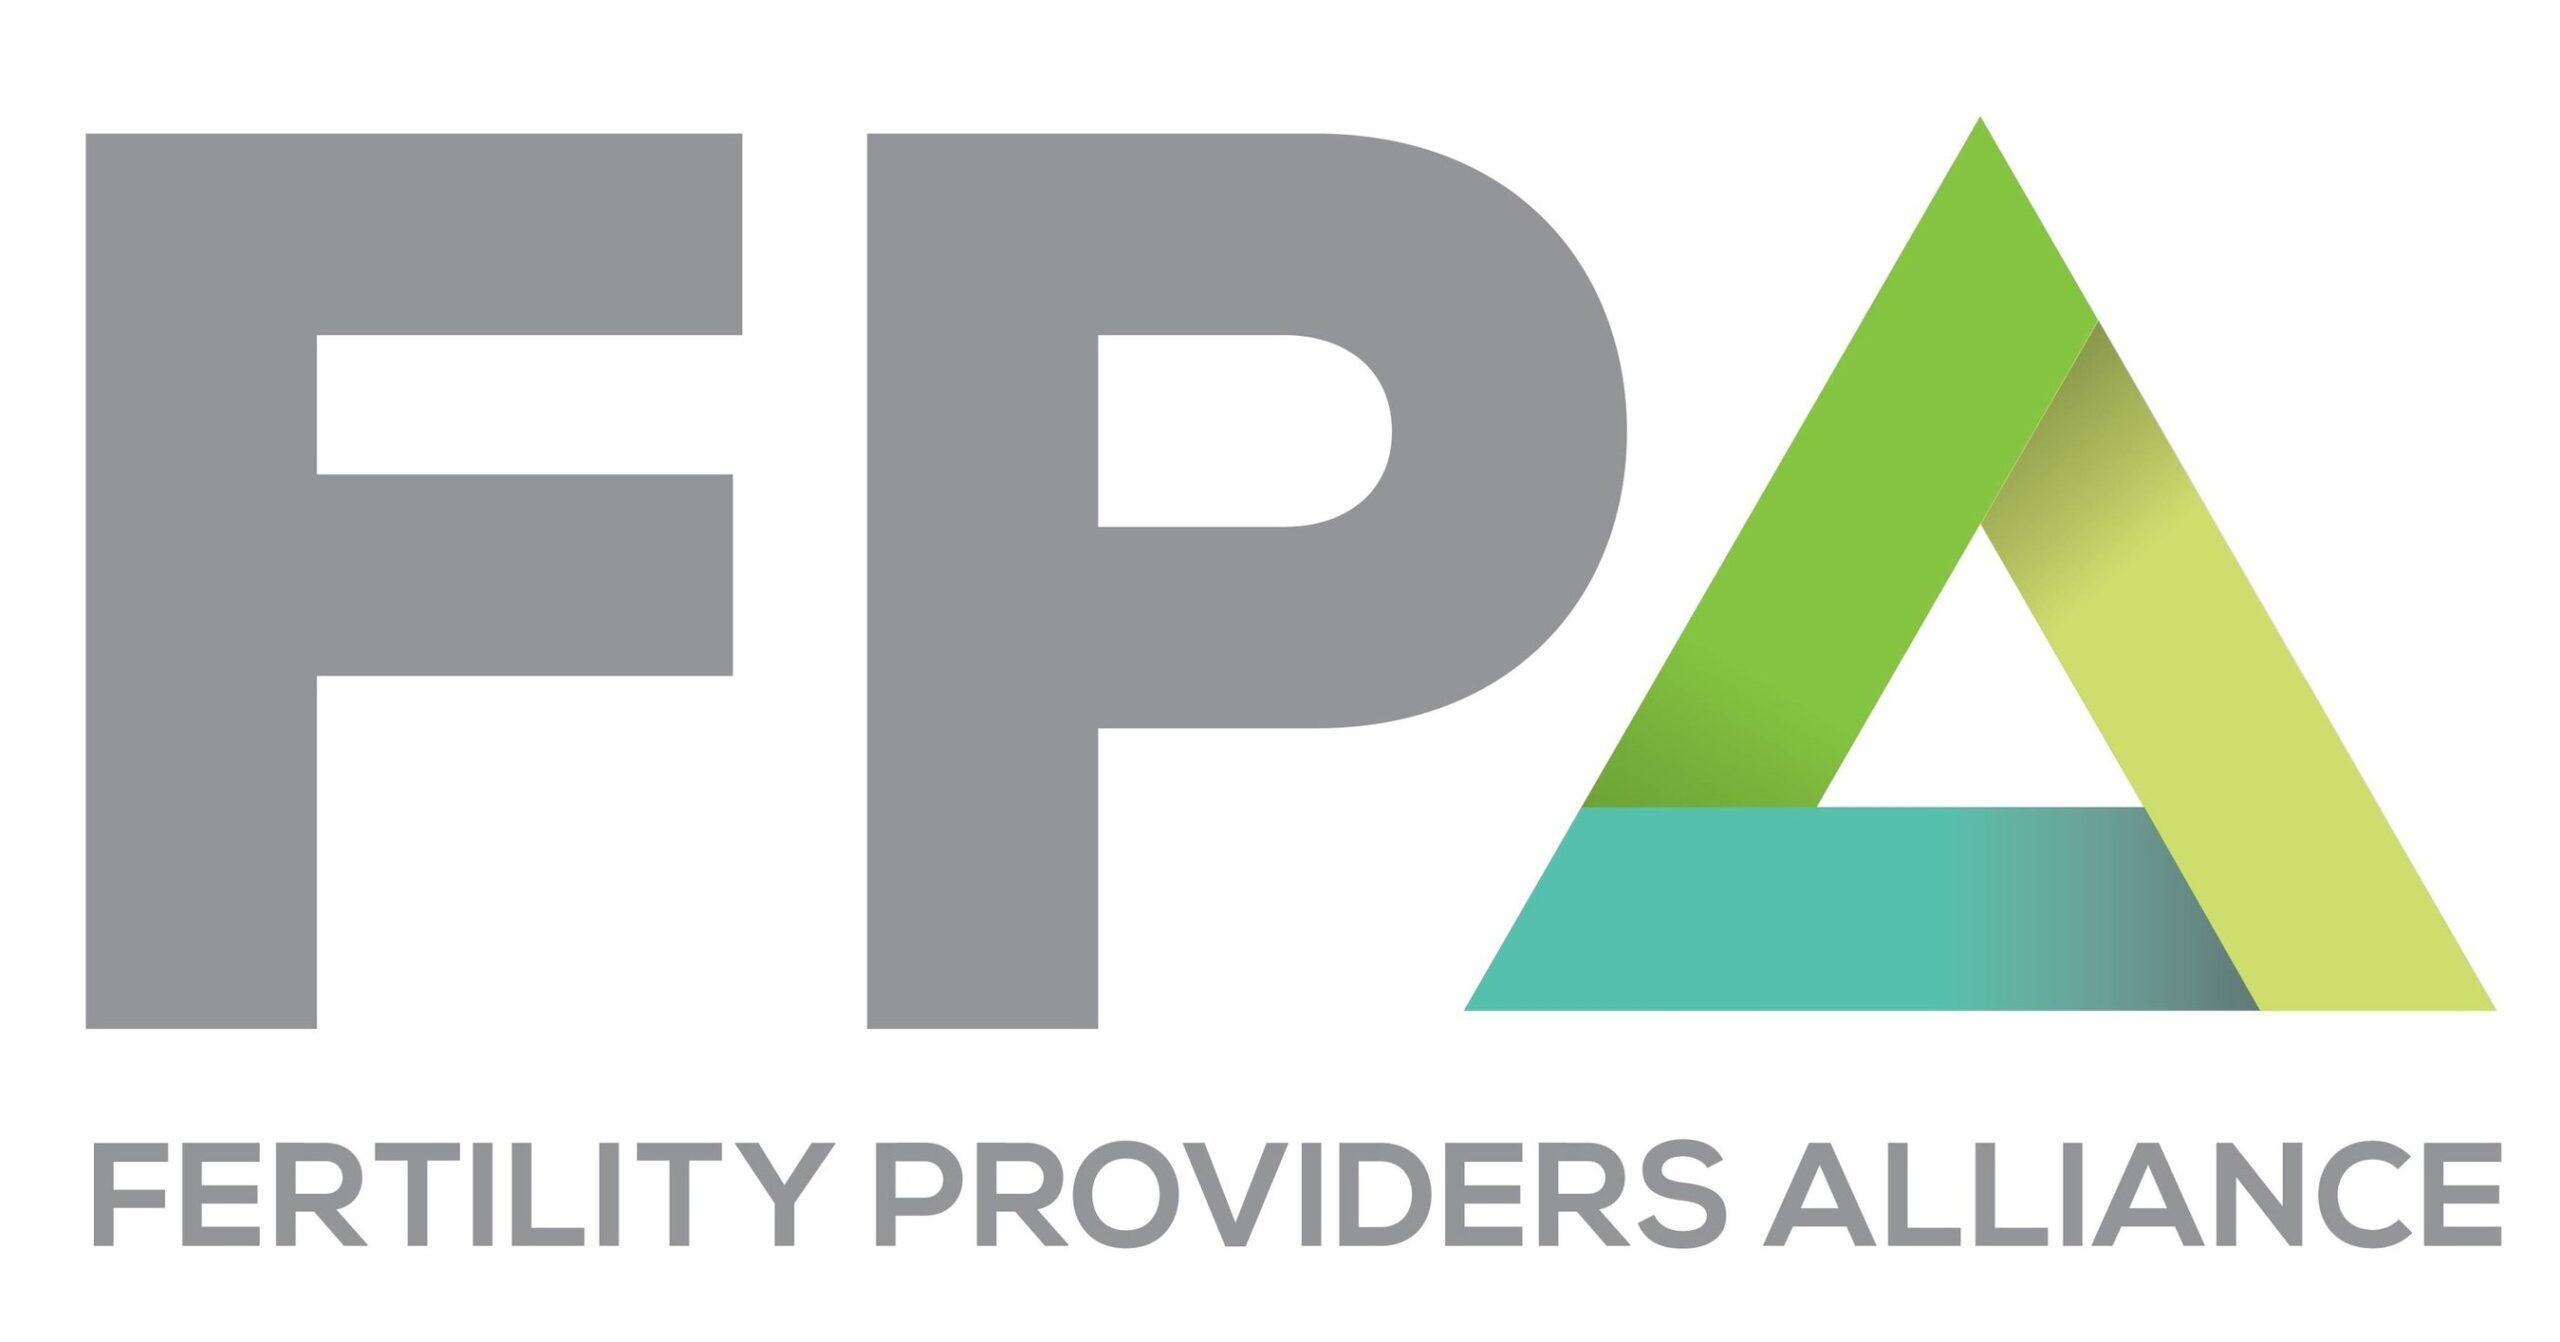 fertility-providers-alliance